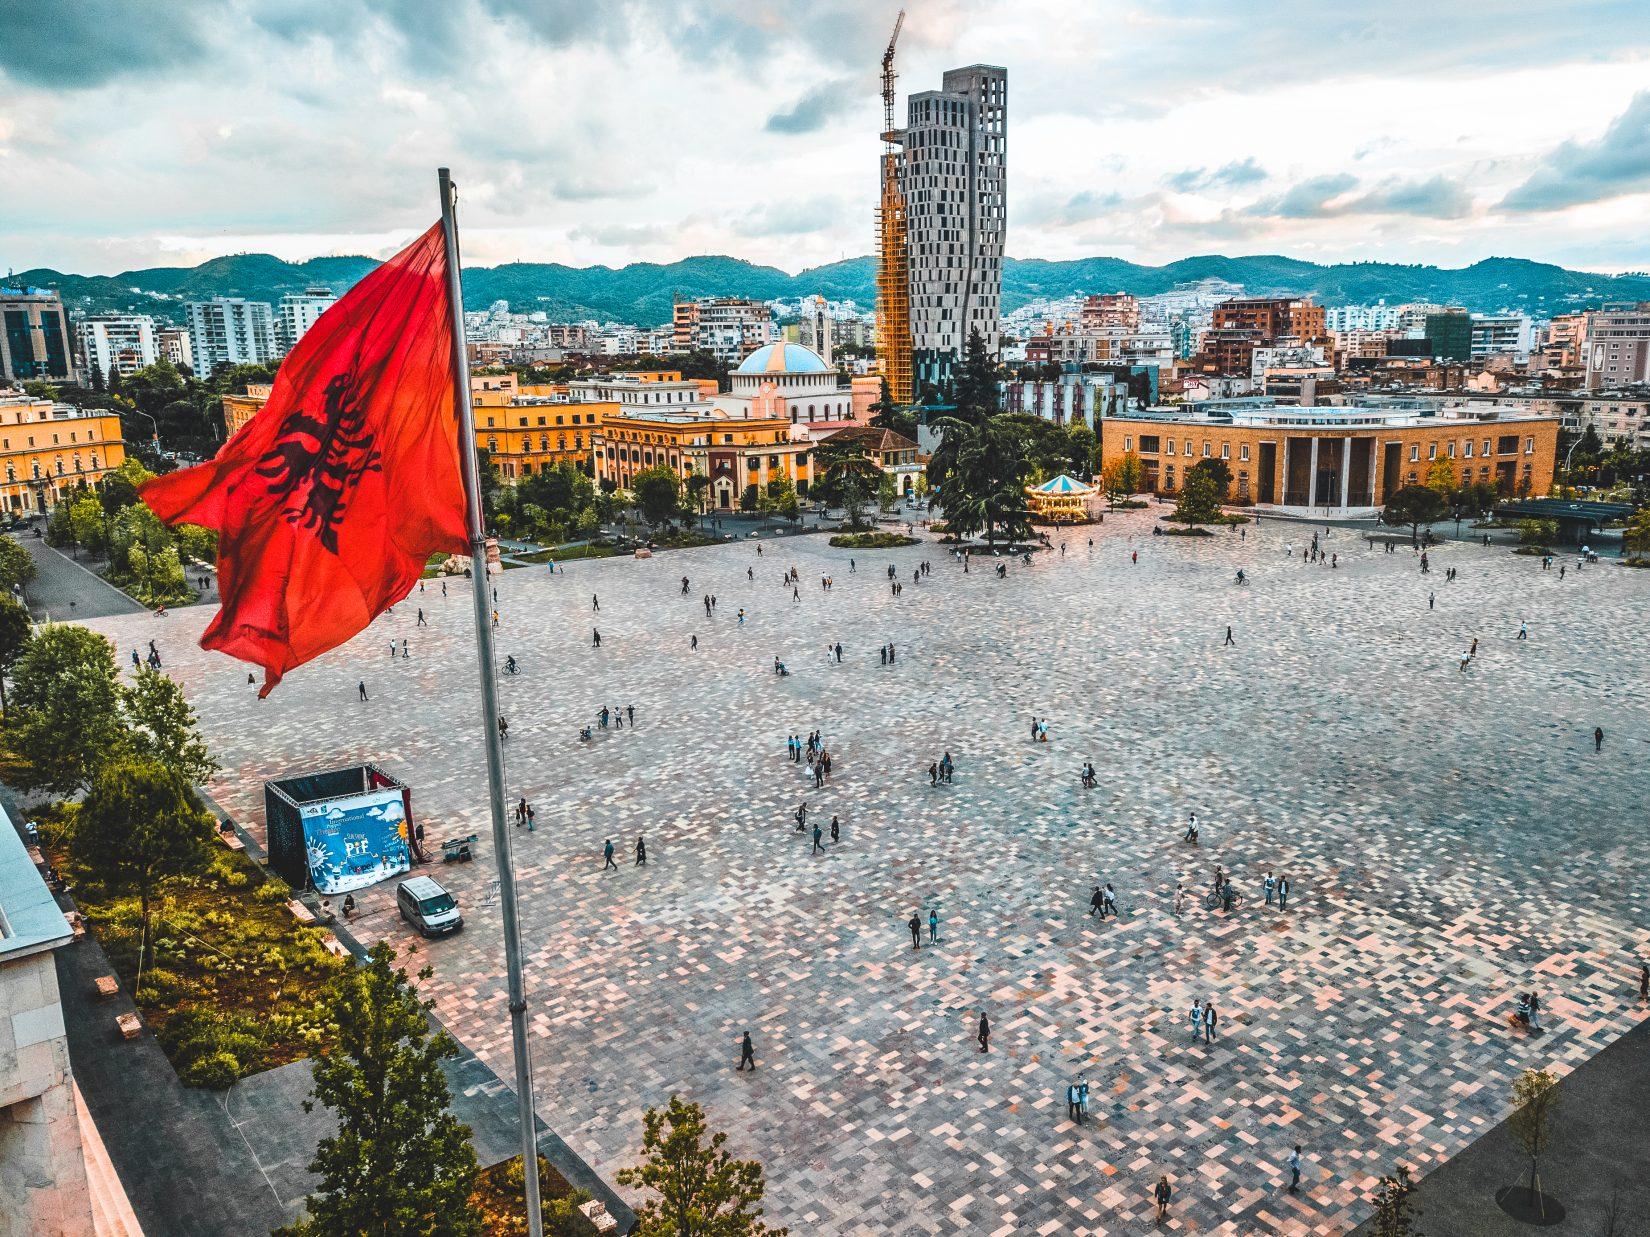 albanija-pred-izborom-dati-rami-treci-mandat-ili-sansu-basi